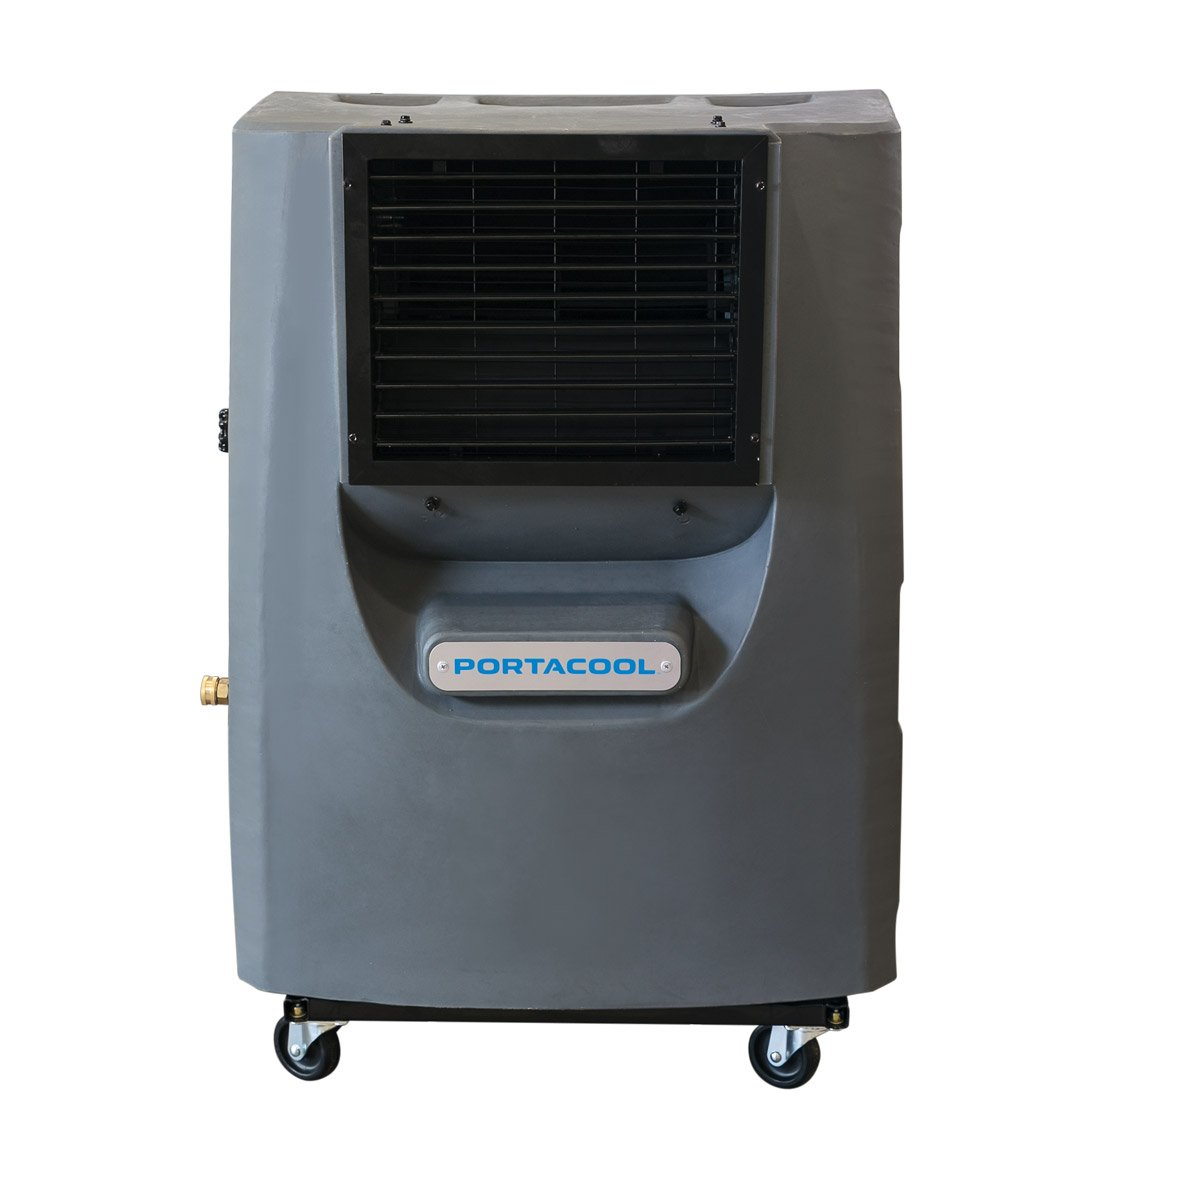 Portacool PACCY130GA1 Cyclone 130 Portable Evaporative Cooler